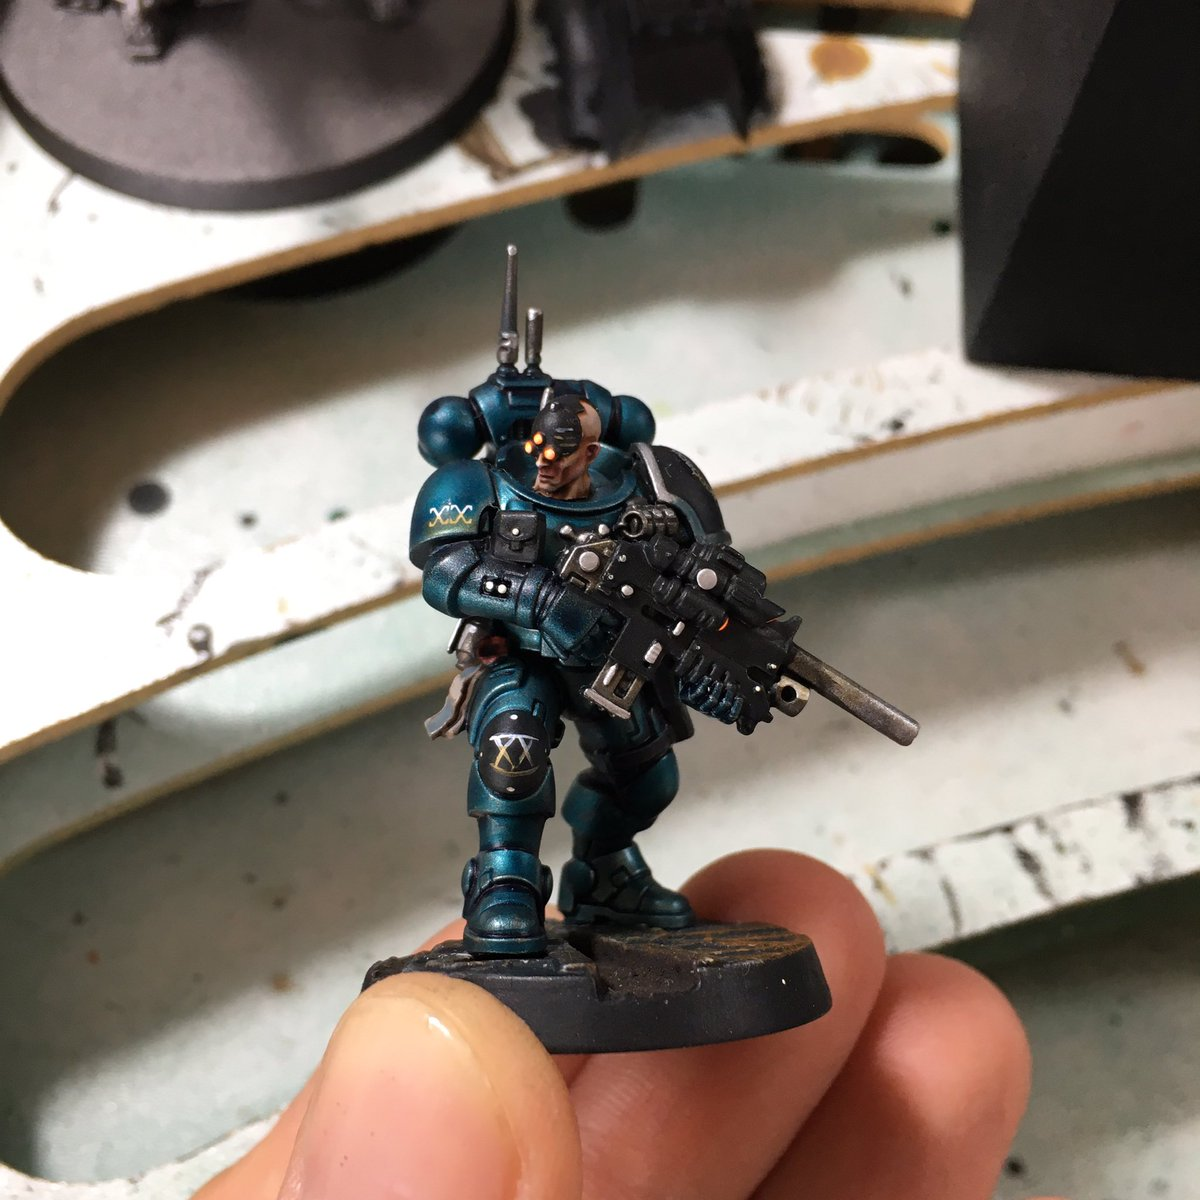 Alpha Legionnaire WIP II  #paintingwarhammer #gamesworkshop #warhammer40k #paintingblacklibrary #paintingwarhammer40k #warhammercomunity #paintingforgeworld #spacemarines #new40k #adeptusastartes https://t.co/4r4XMgOlKw